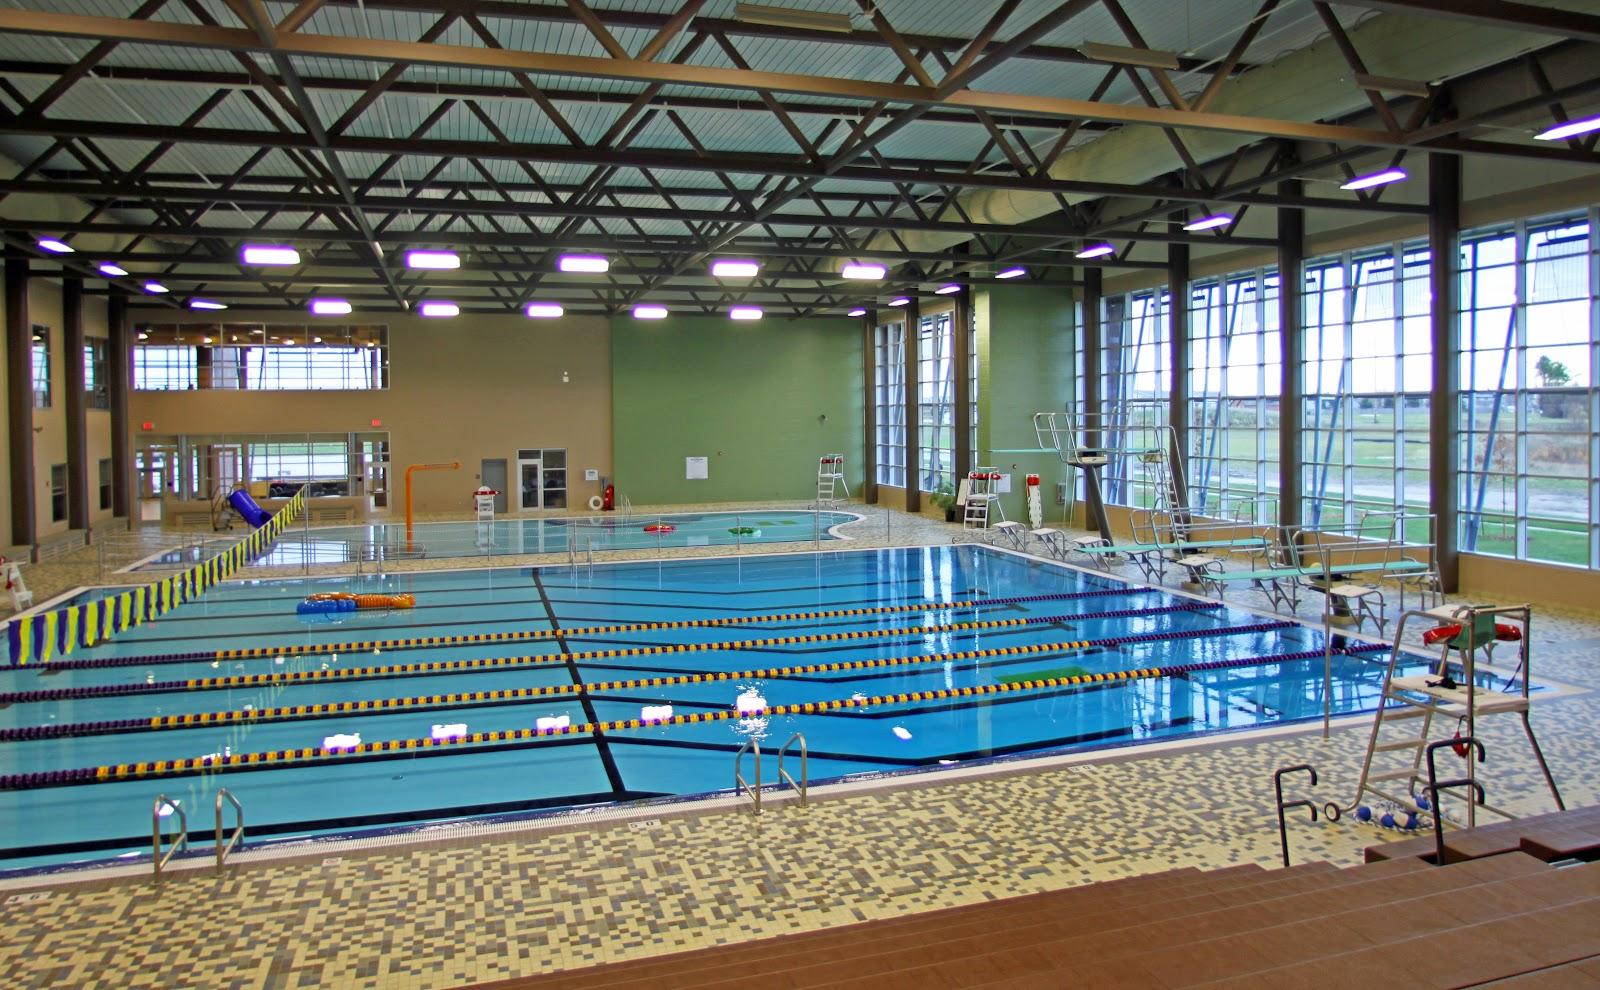 Ymca Swimming Pool Image